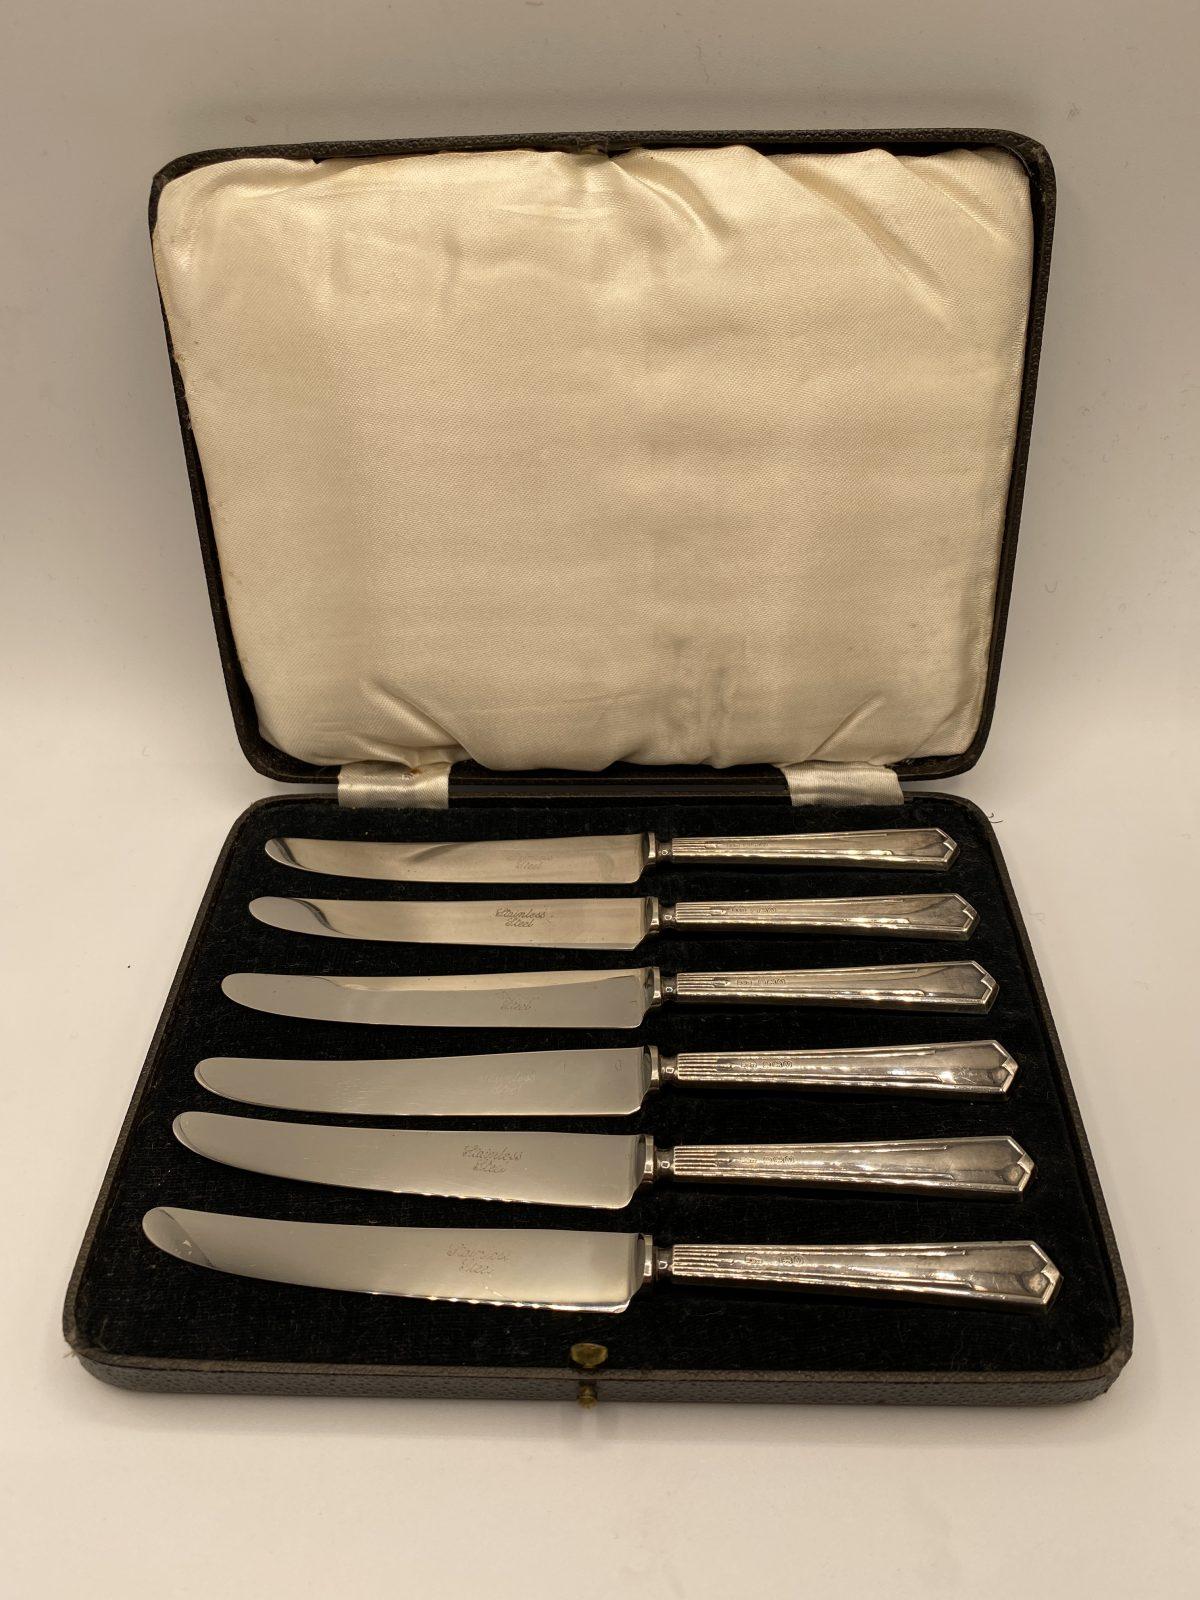 G3 - A Boxed Set of 6 Silver Handled Tea Knives, Art Deco, Birmingham 1938.  £84